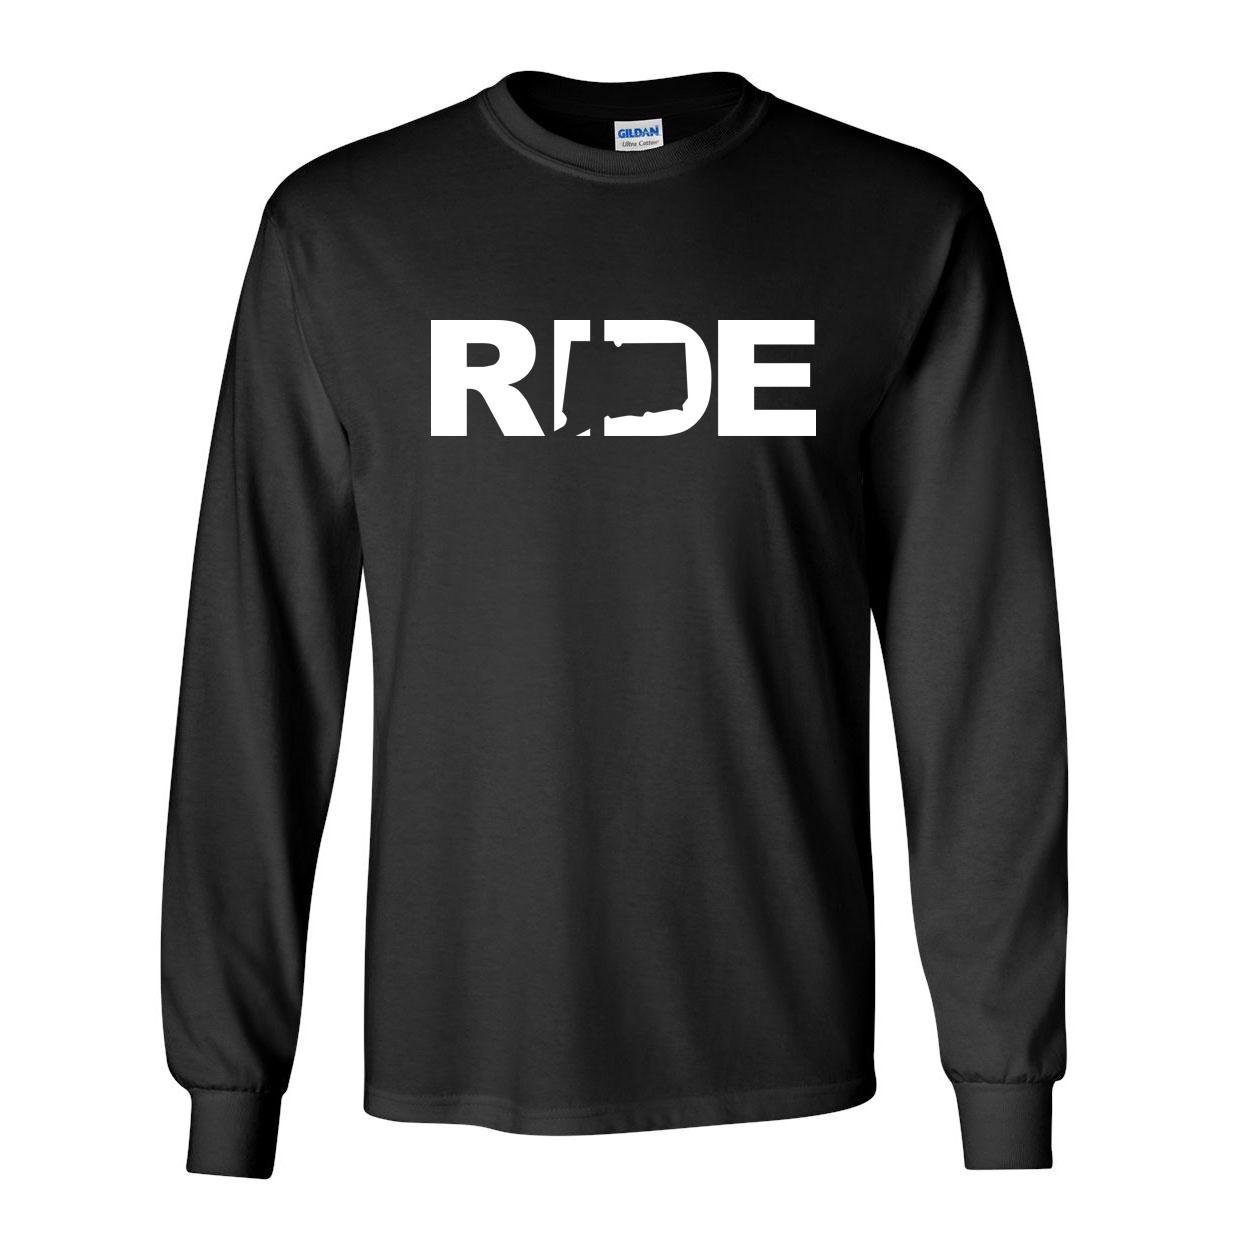 Ride Connecticut Classic Long Sleeve T-Shirt Black (White Logo)